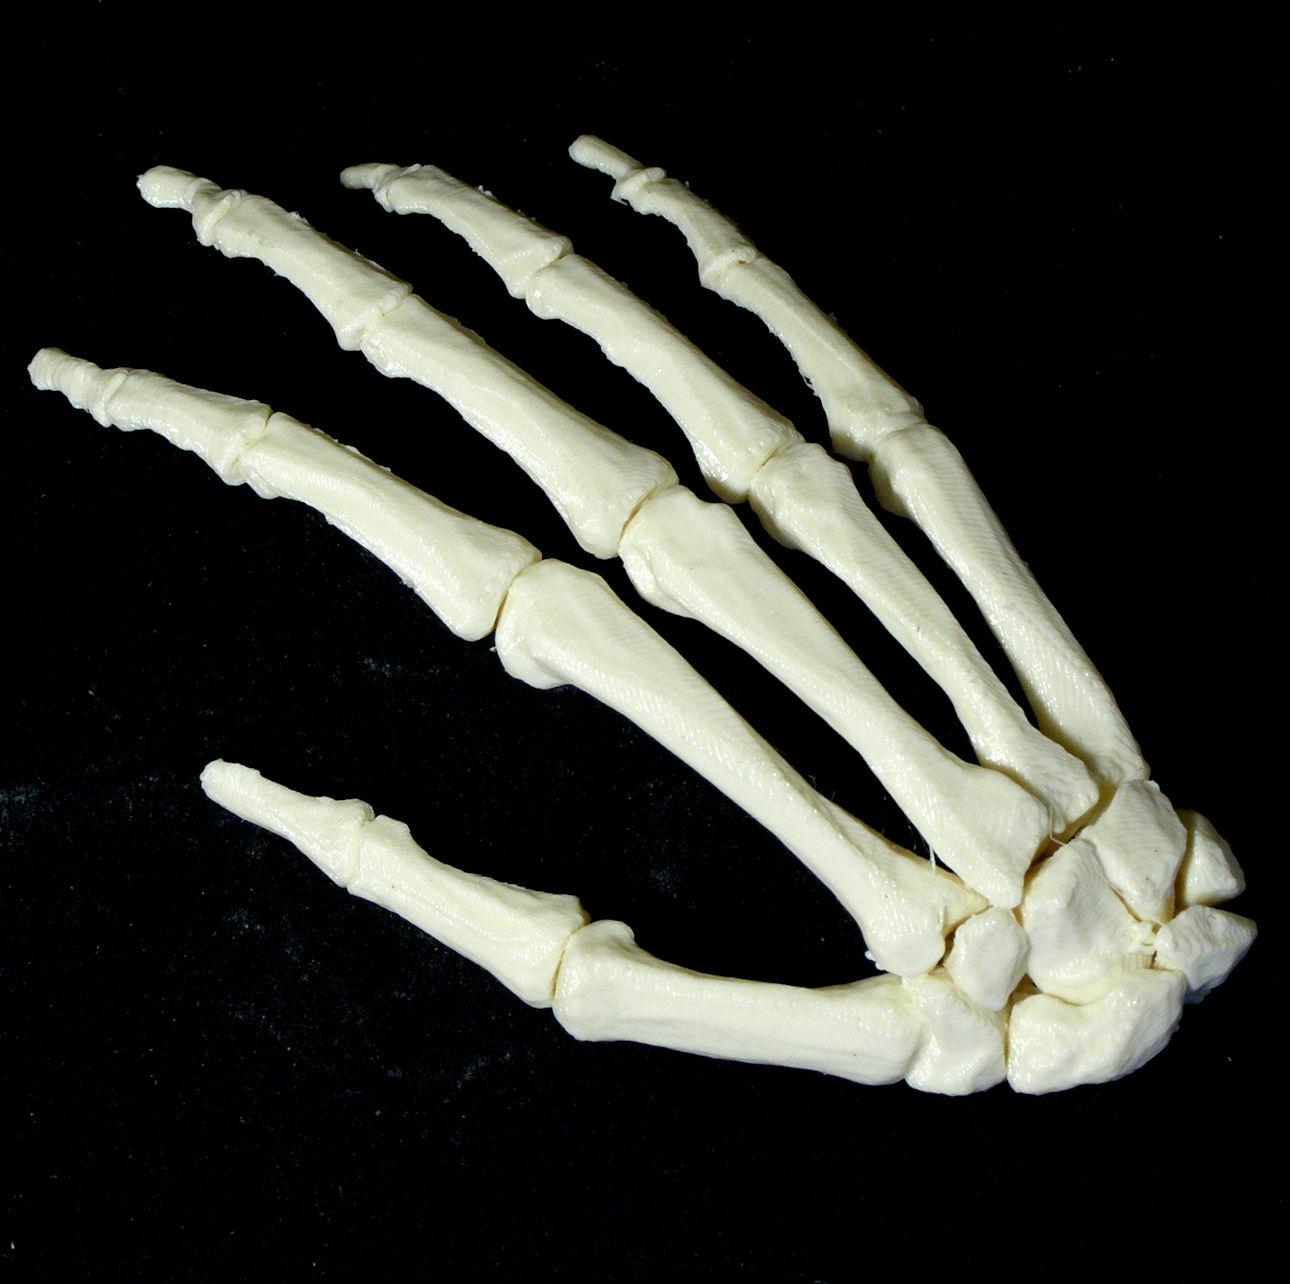 Bone - Hand - Right image